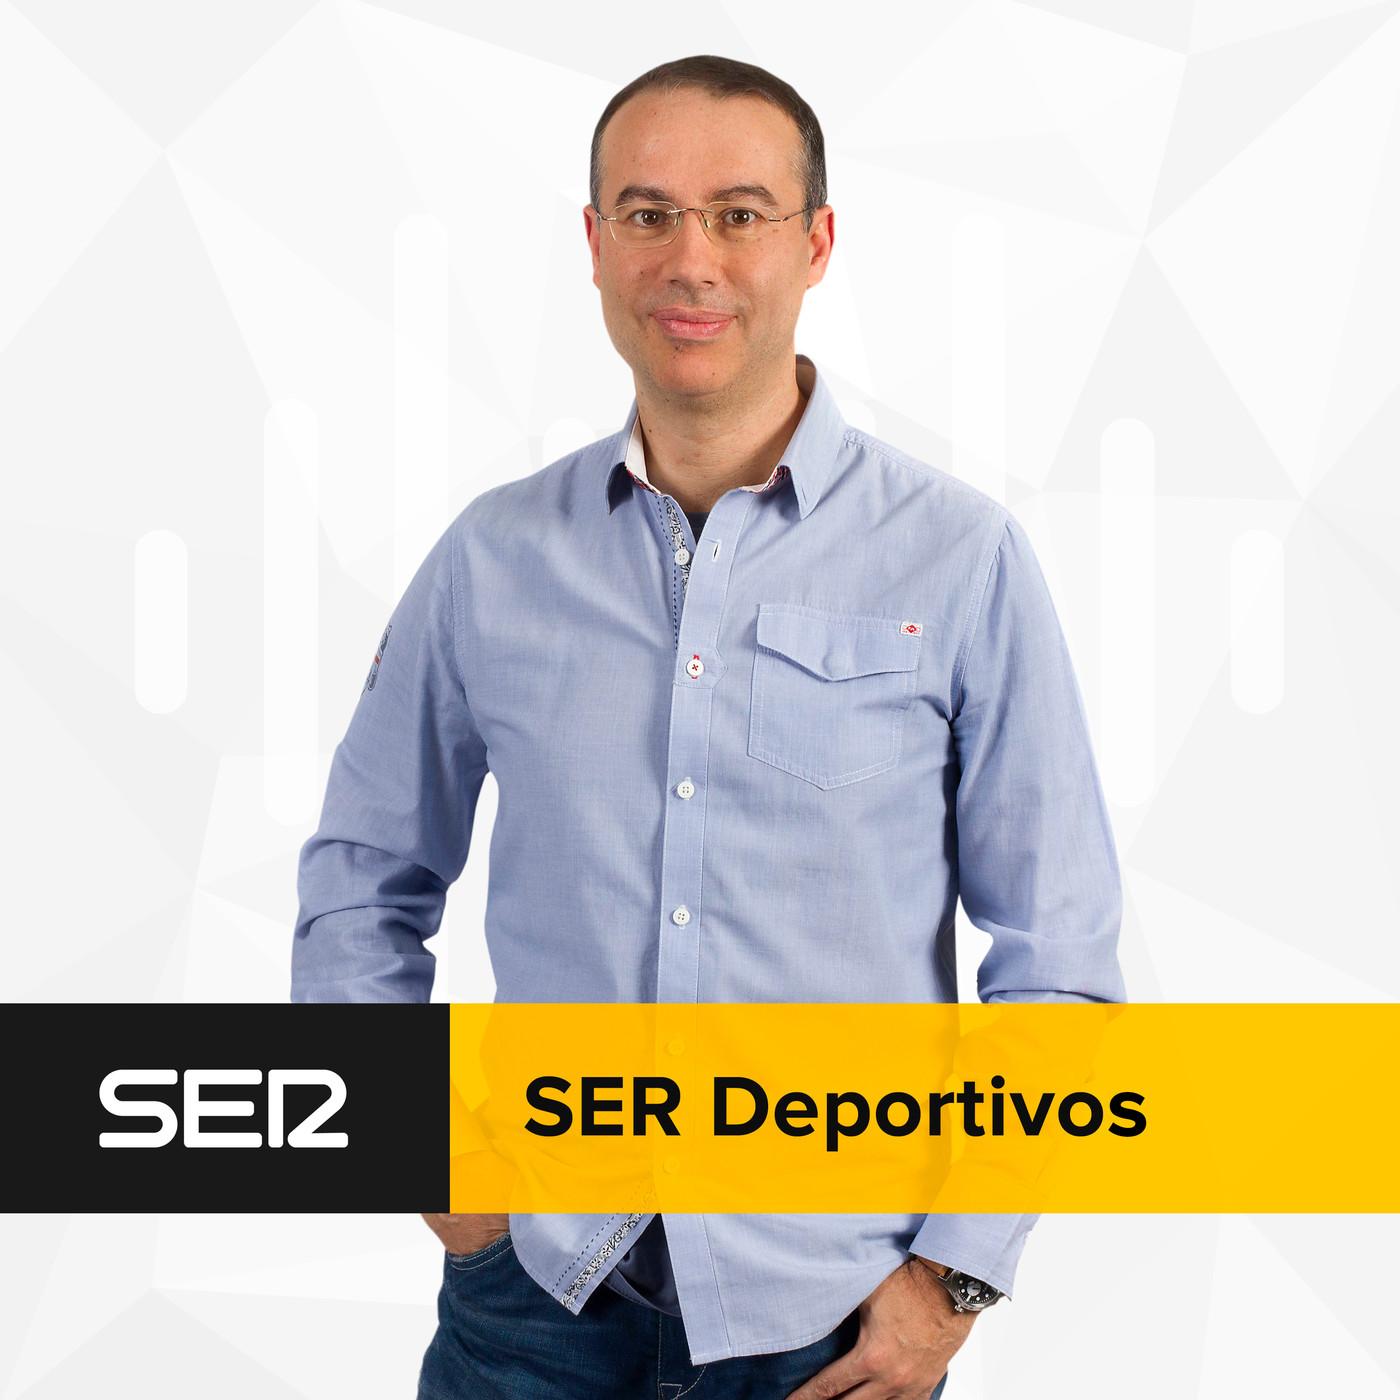 SER Deportivos (20/10/2020)